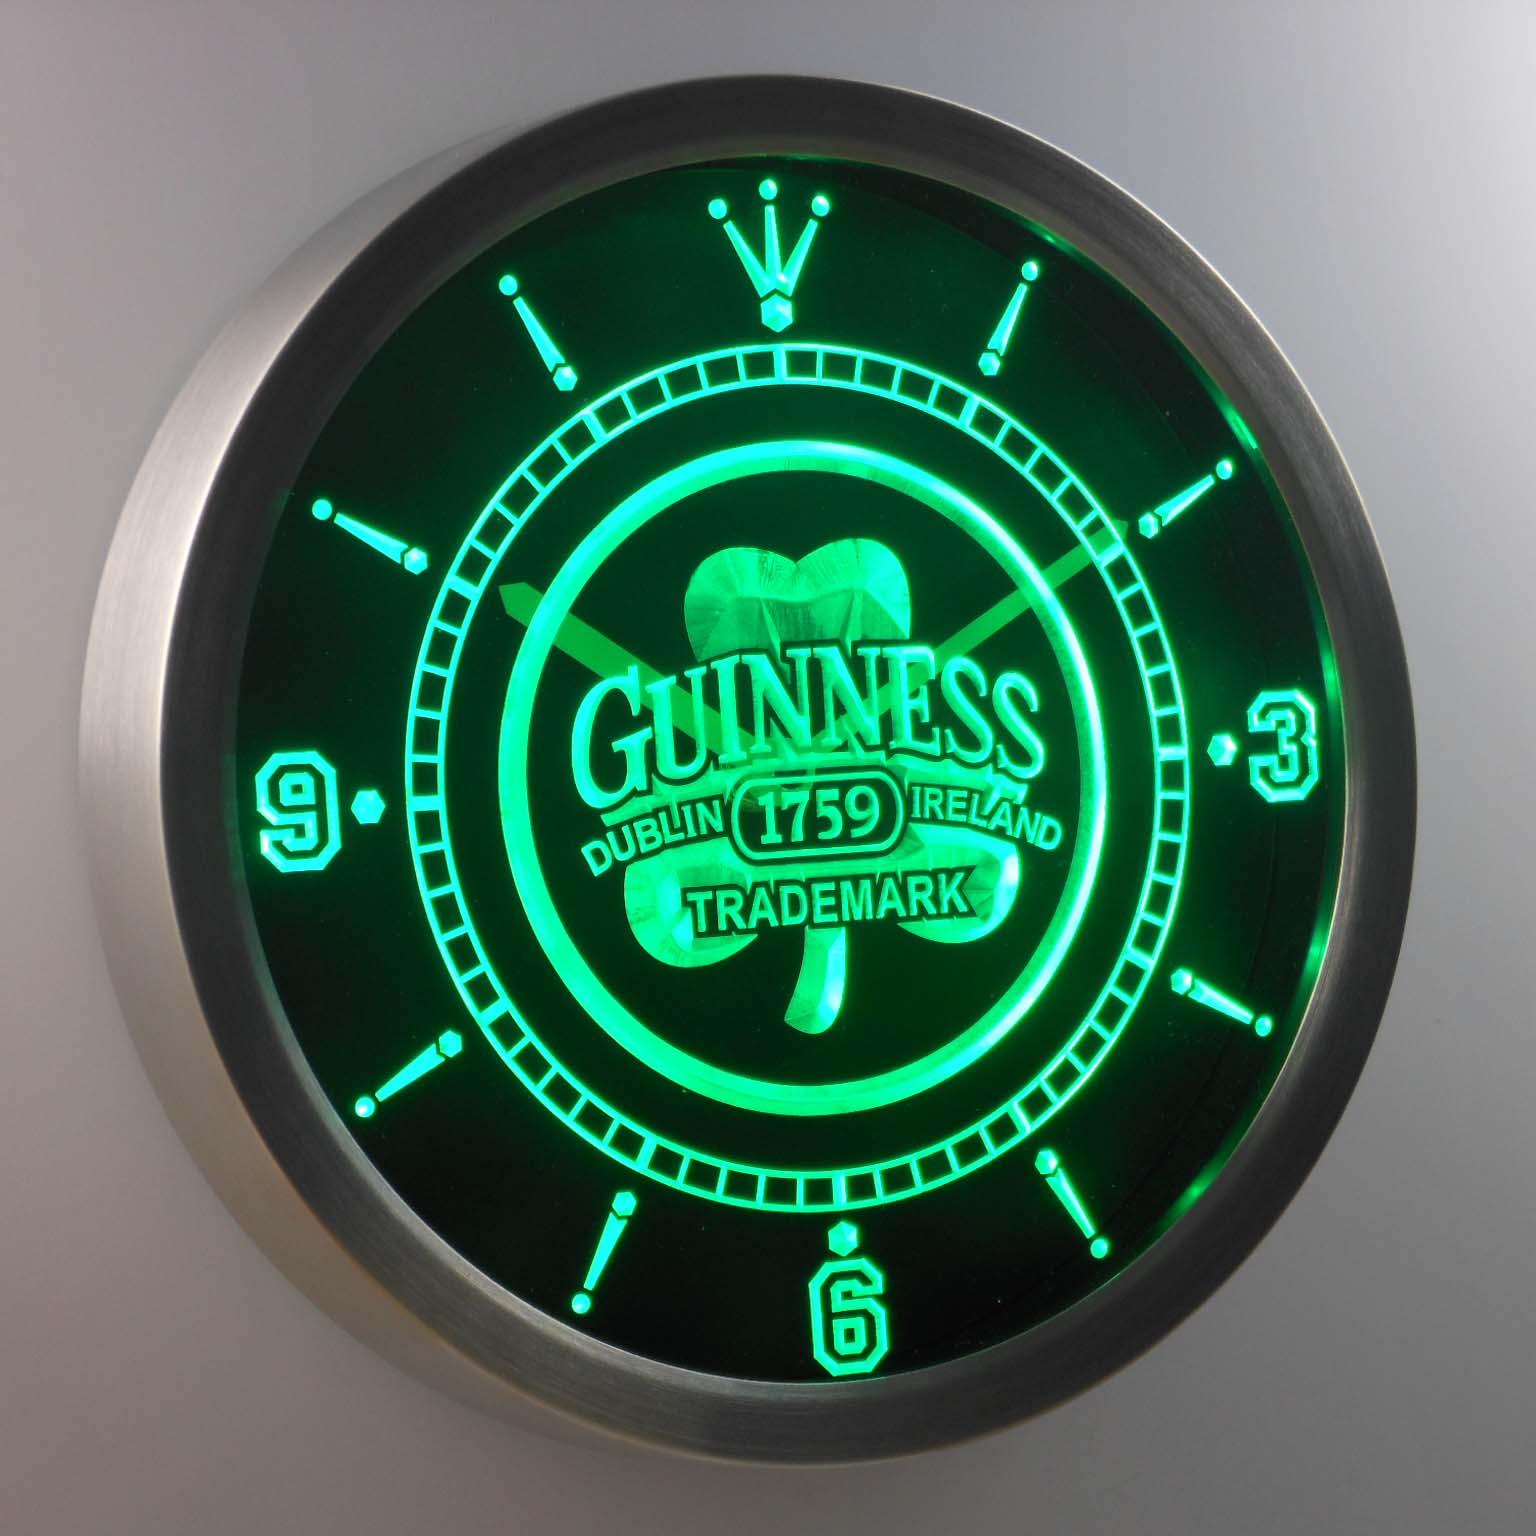 nc0108 Guinness 1759 Shamrock Bar Beer Neon Light Signs LED Wall Clock